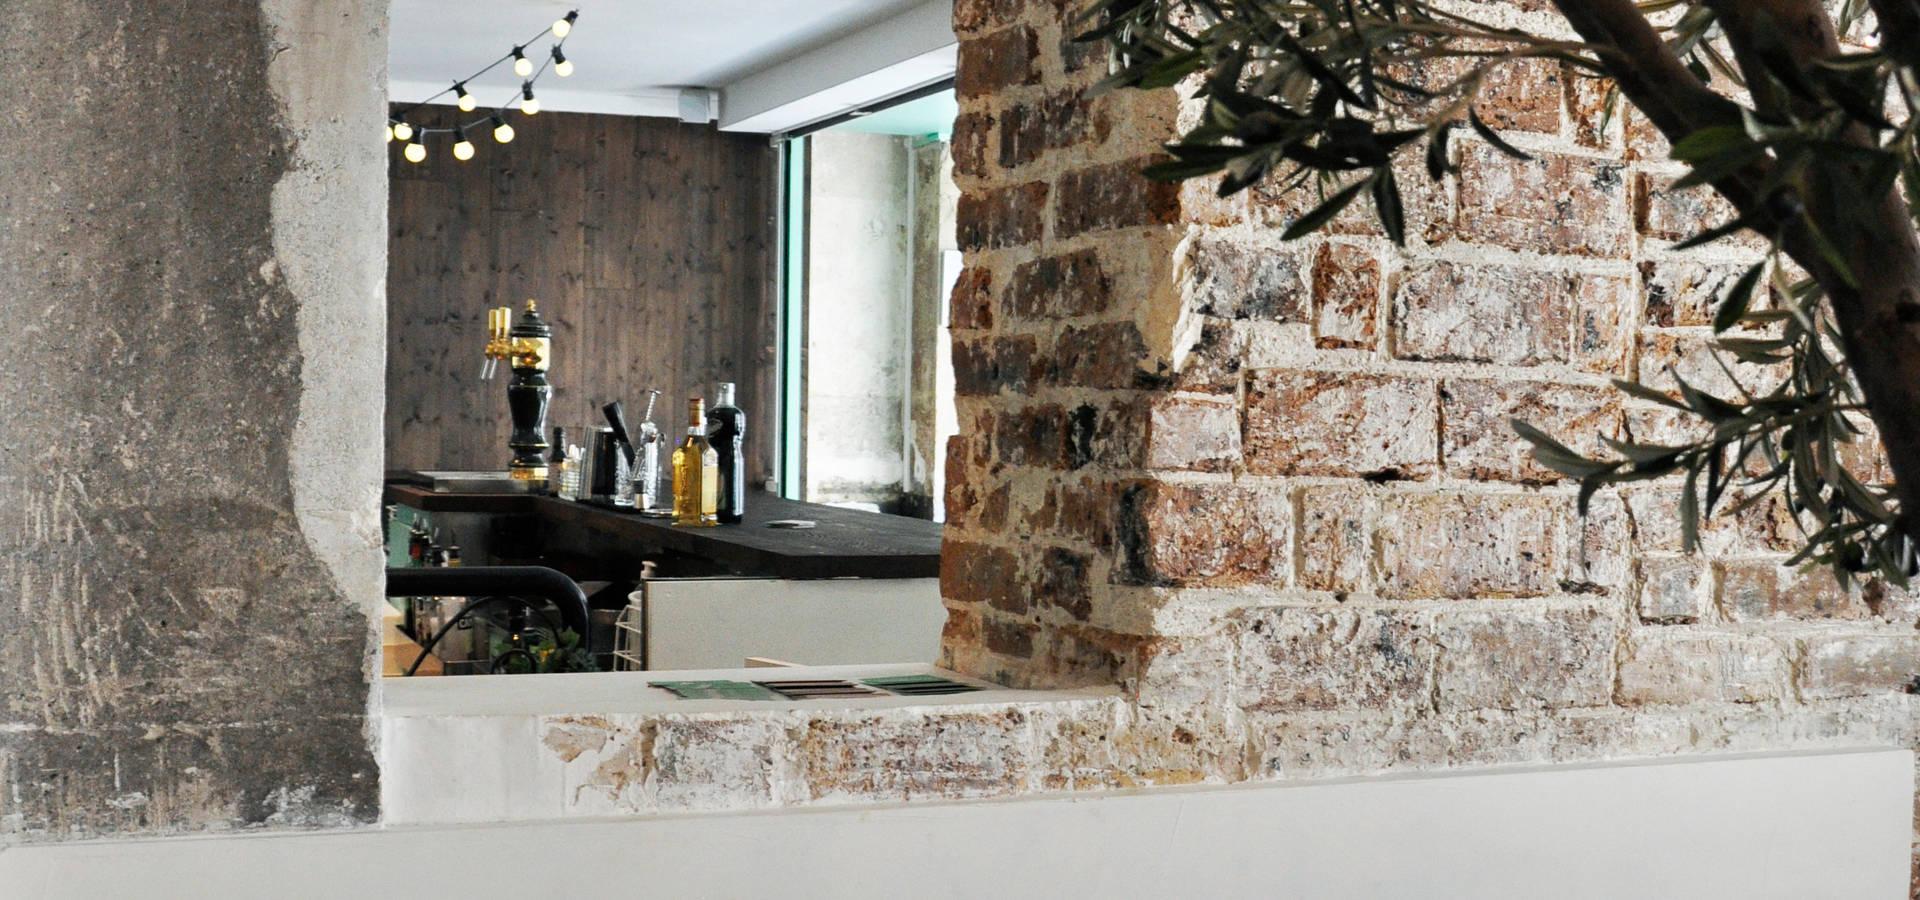 la cicciolina restaurant paris profesjonalista f lsom homify. Black Bedroom Furniture Sets. Home Design Ideas